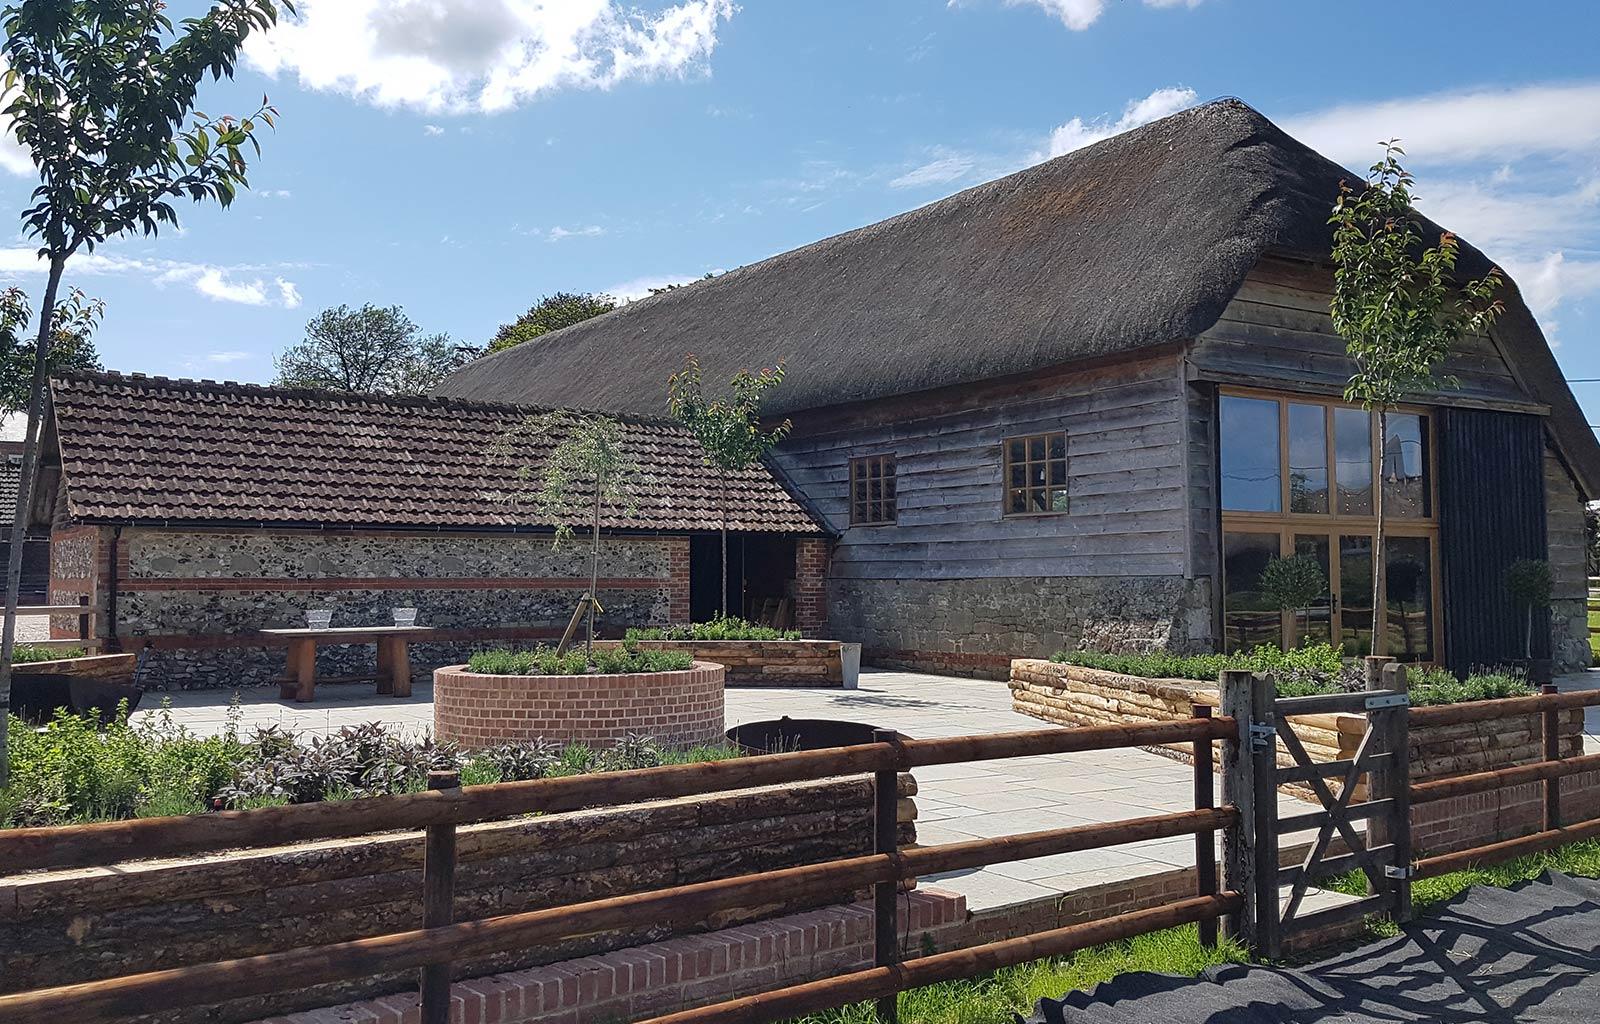 Wedding & Private Hire Barn in Wiltshire | Bowerchalke Barn